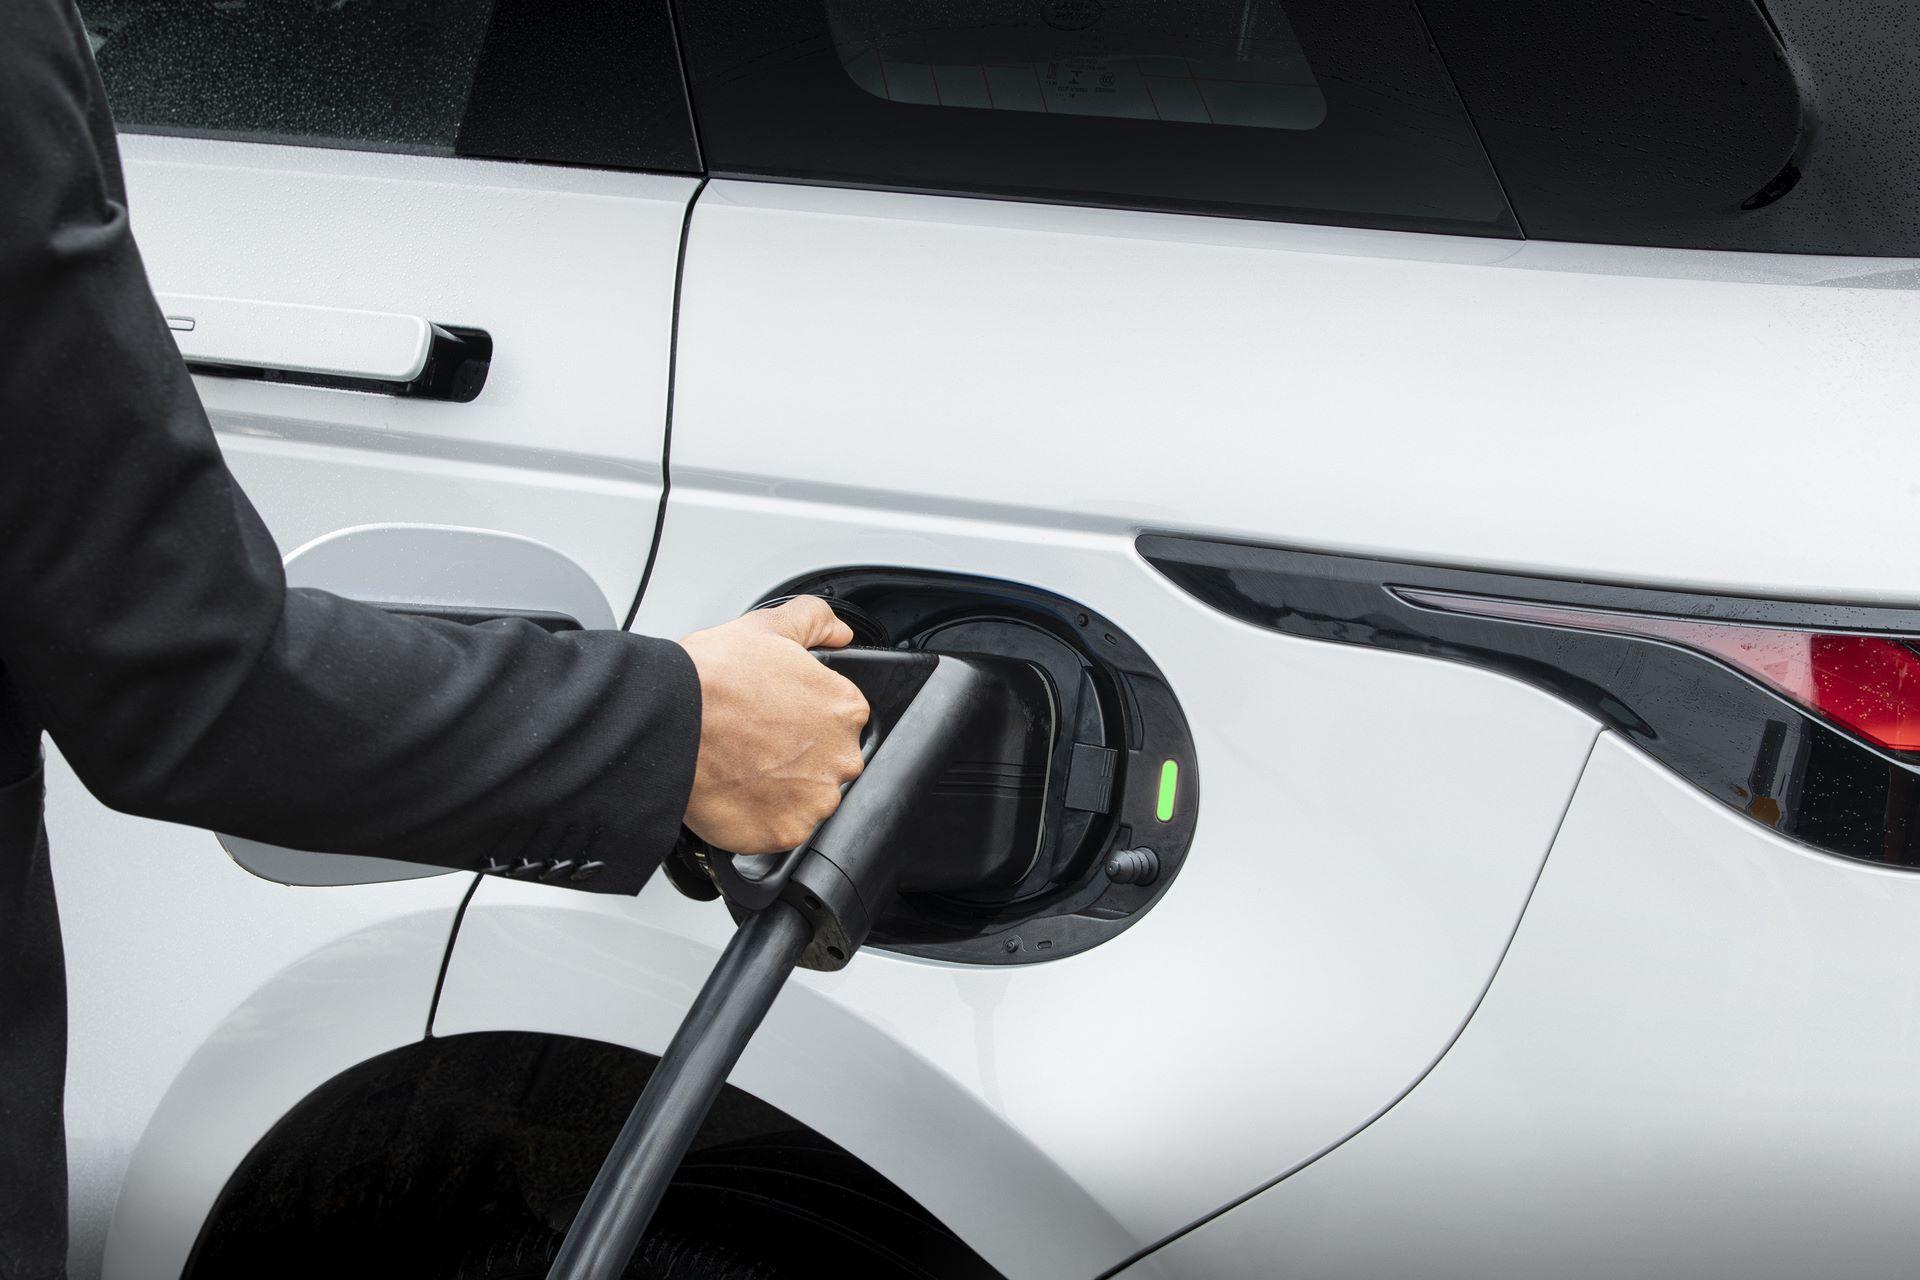 Plug-in-hybrid-Rabge-Rover-Evoque-PHEV-11